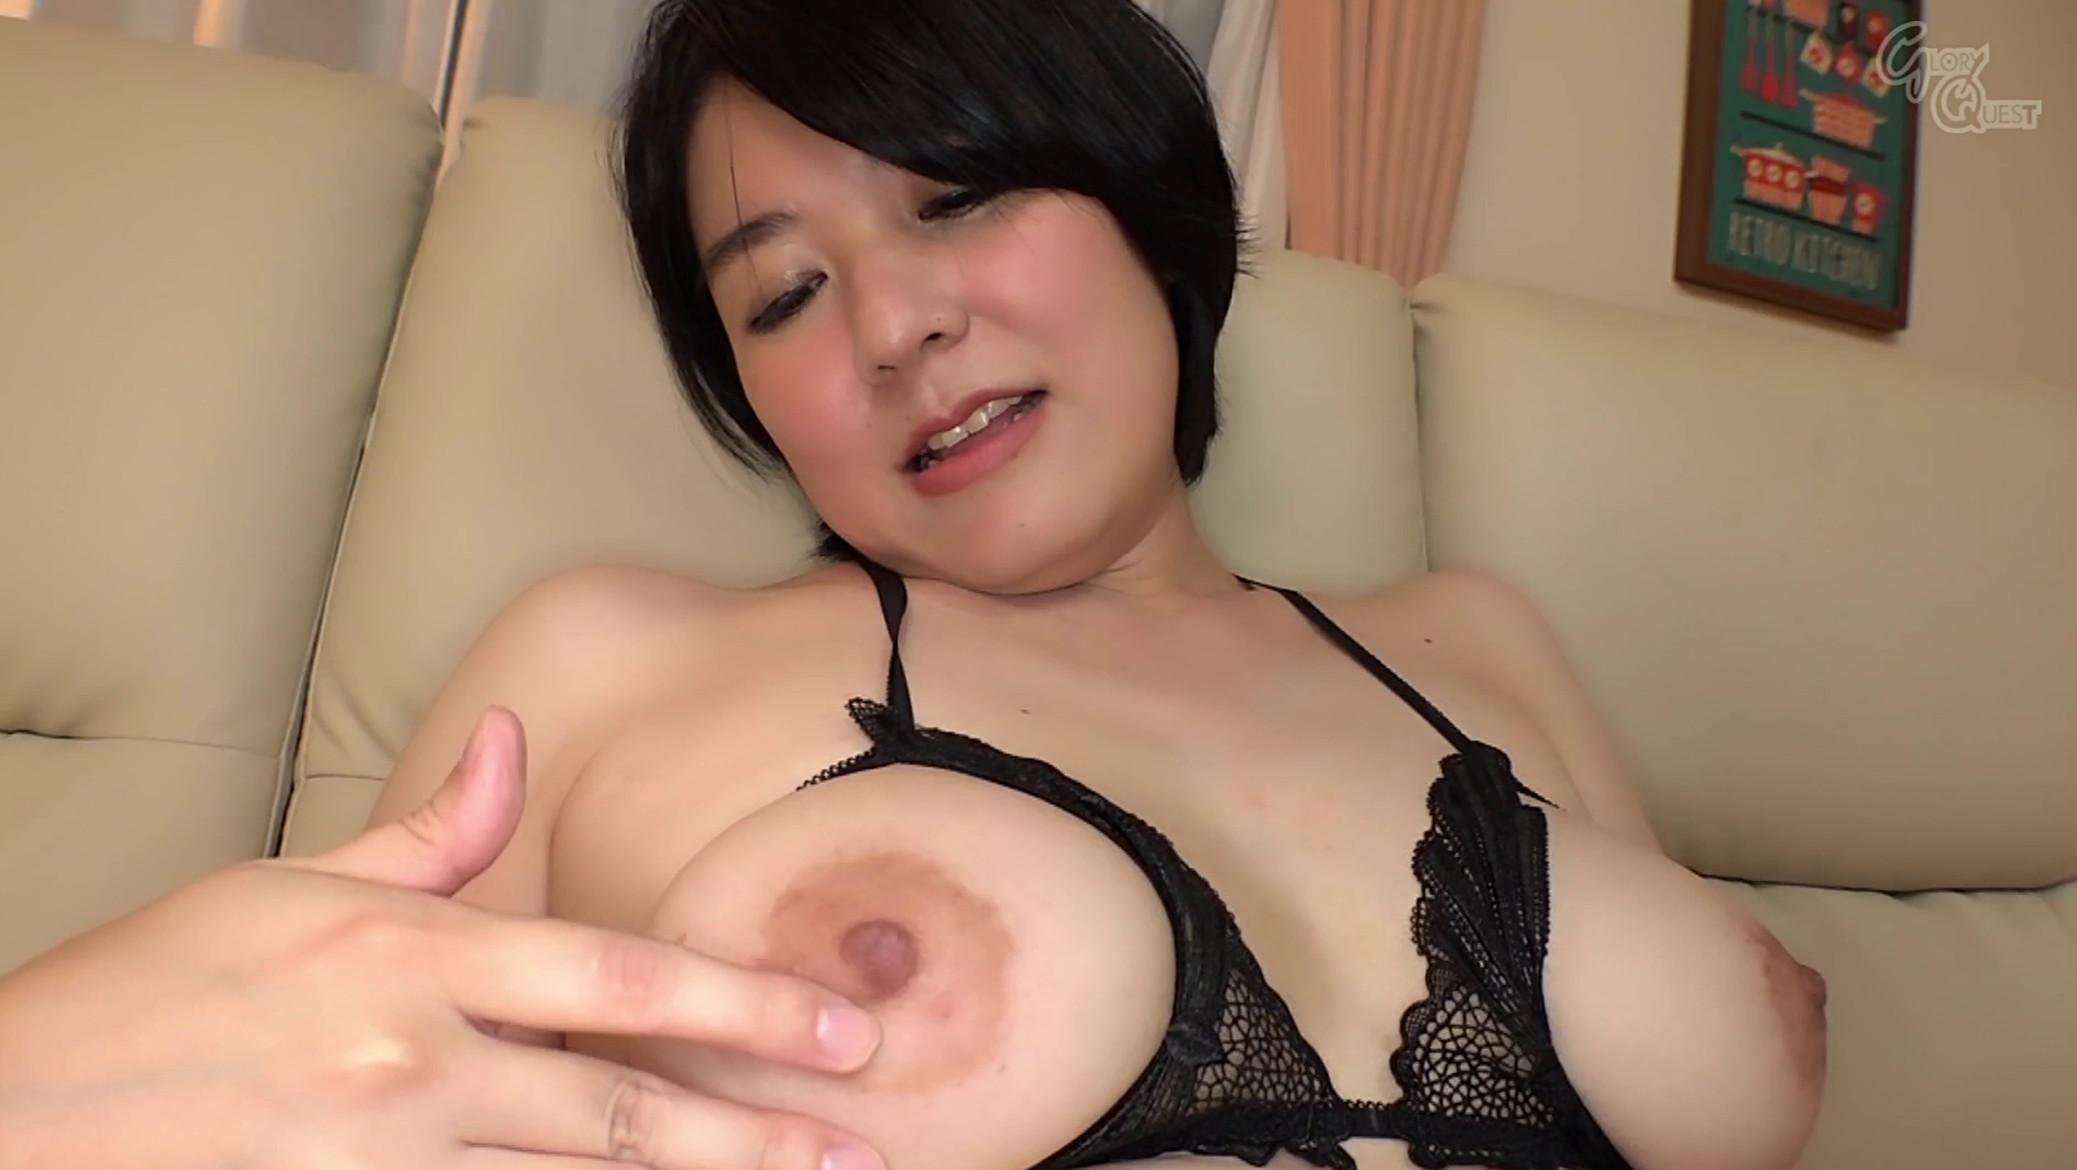 Japanese milf Yui Hachisaki big boobs pics